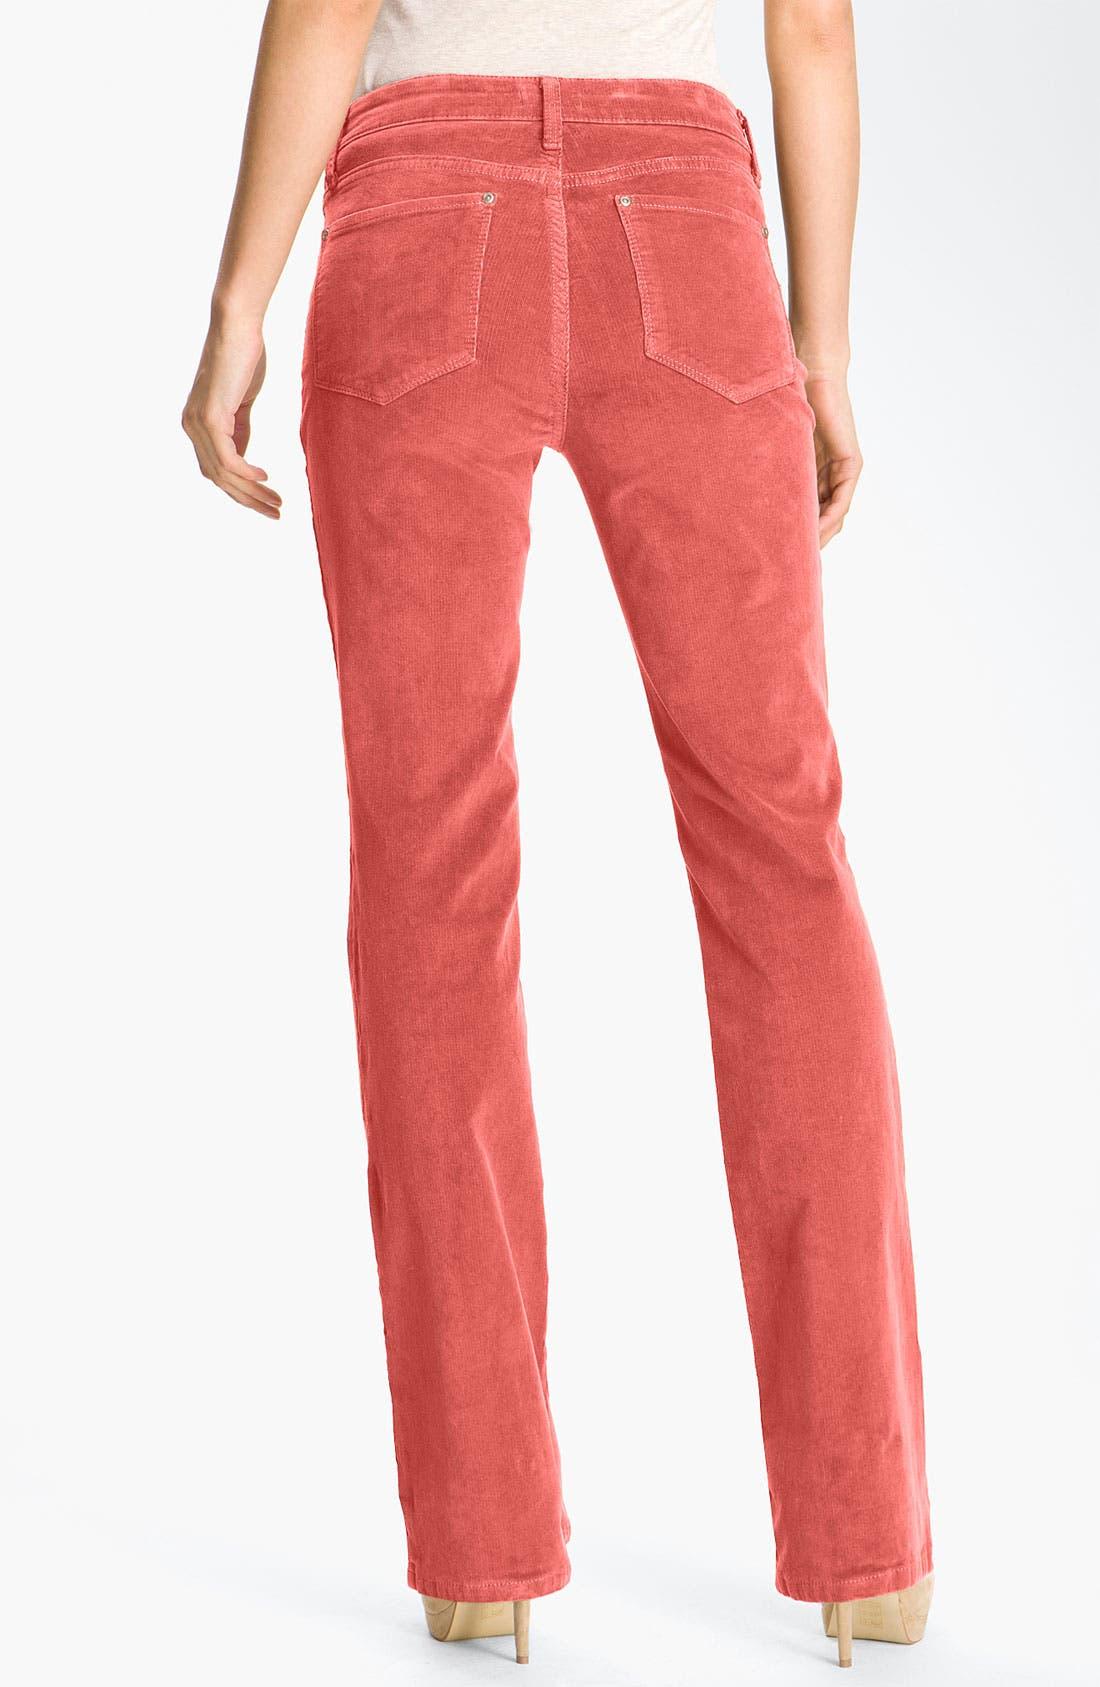 Alternate Image 2  - NYDJ Bootcut Corduroy Jeans (Petite)